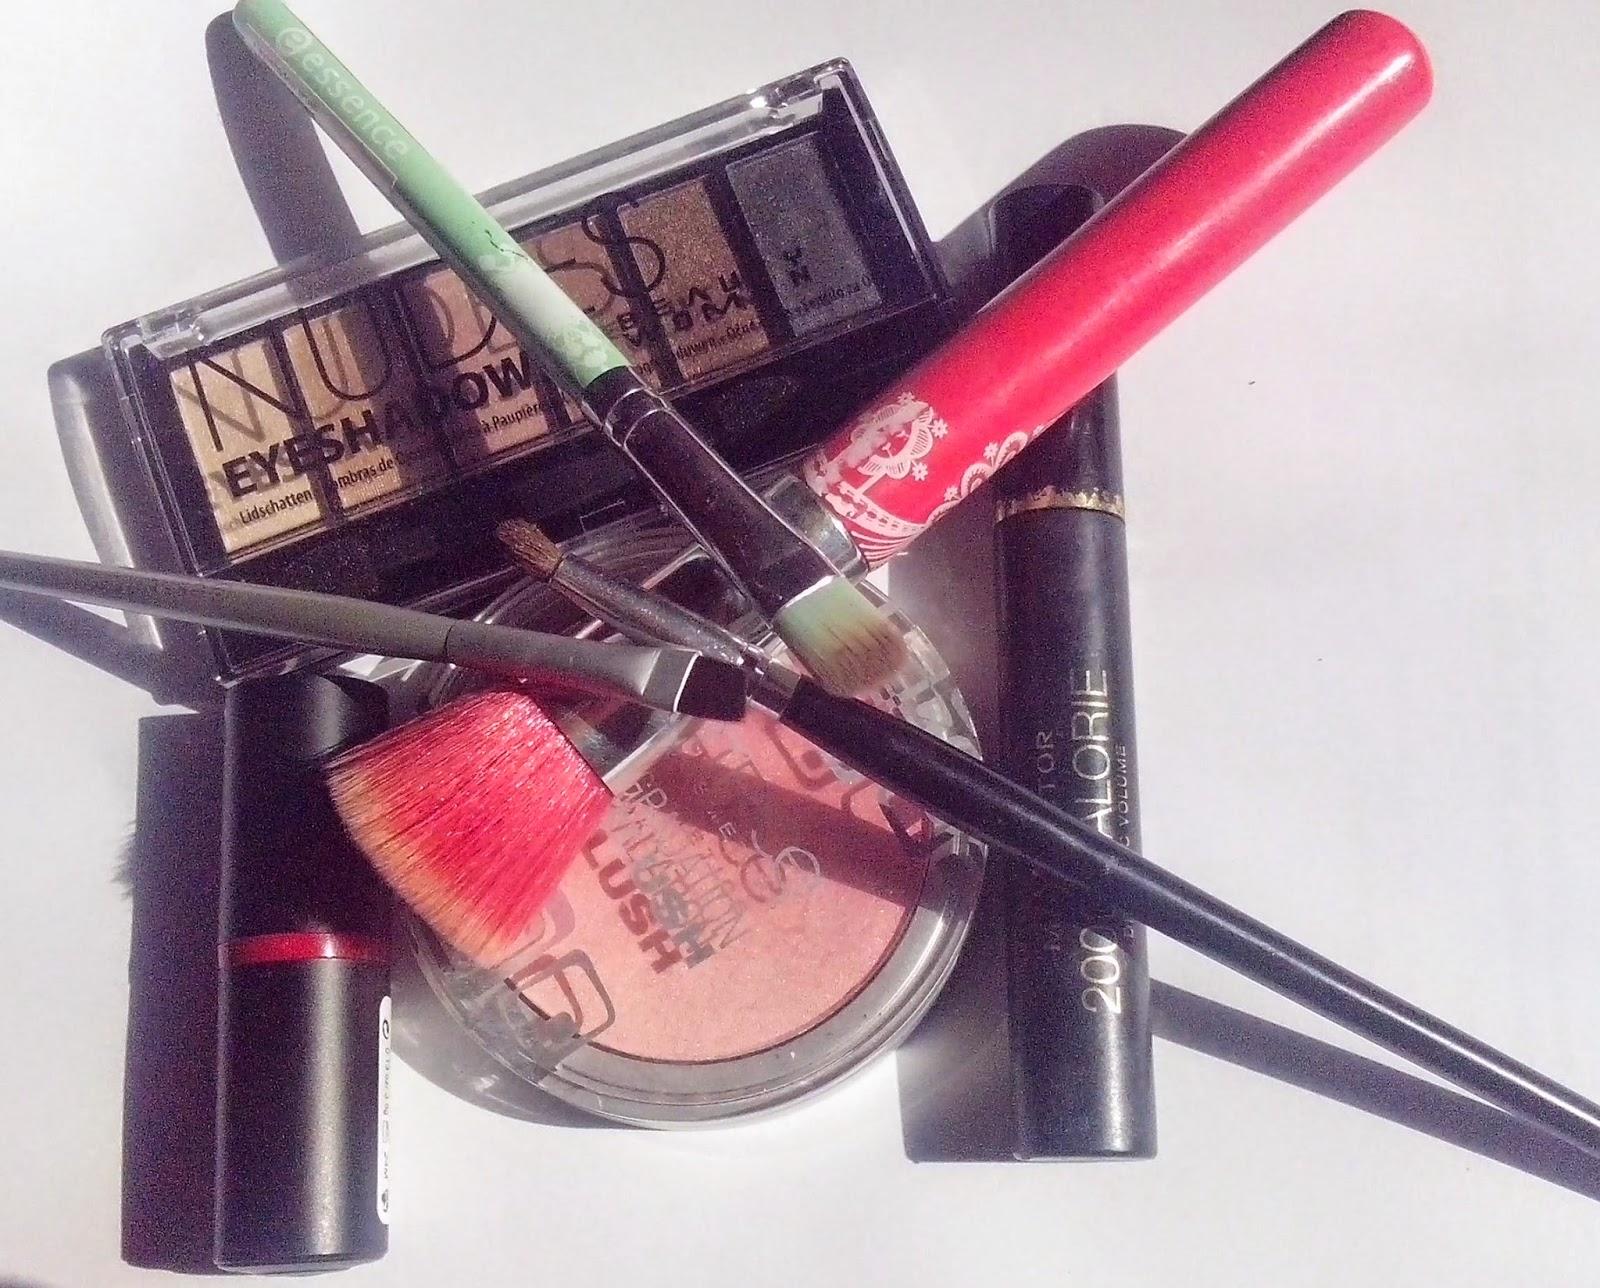 IMG_20150314_111243FOTD-essence-dare-to-wear-lipstick-catrice-gradation-blush-maxfactor-2000-calorie-mascara-beauty-women-nudes-eyeshadow-tedi-coastal-scents-essence-bloom-me-up-natventurista-brushes-eye